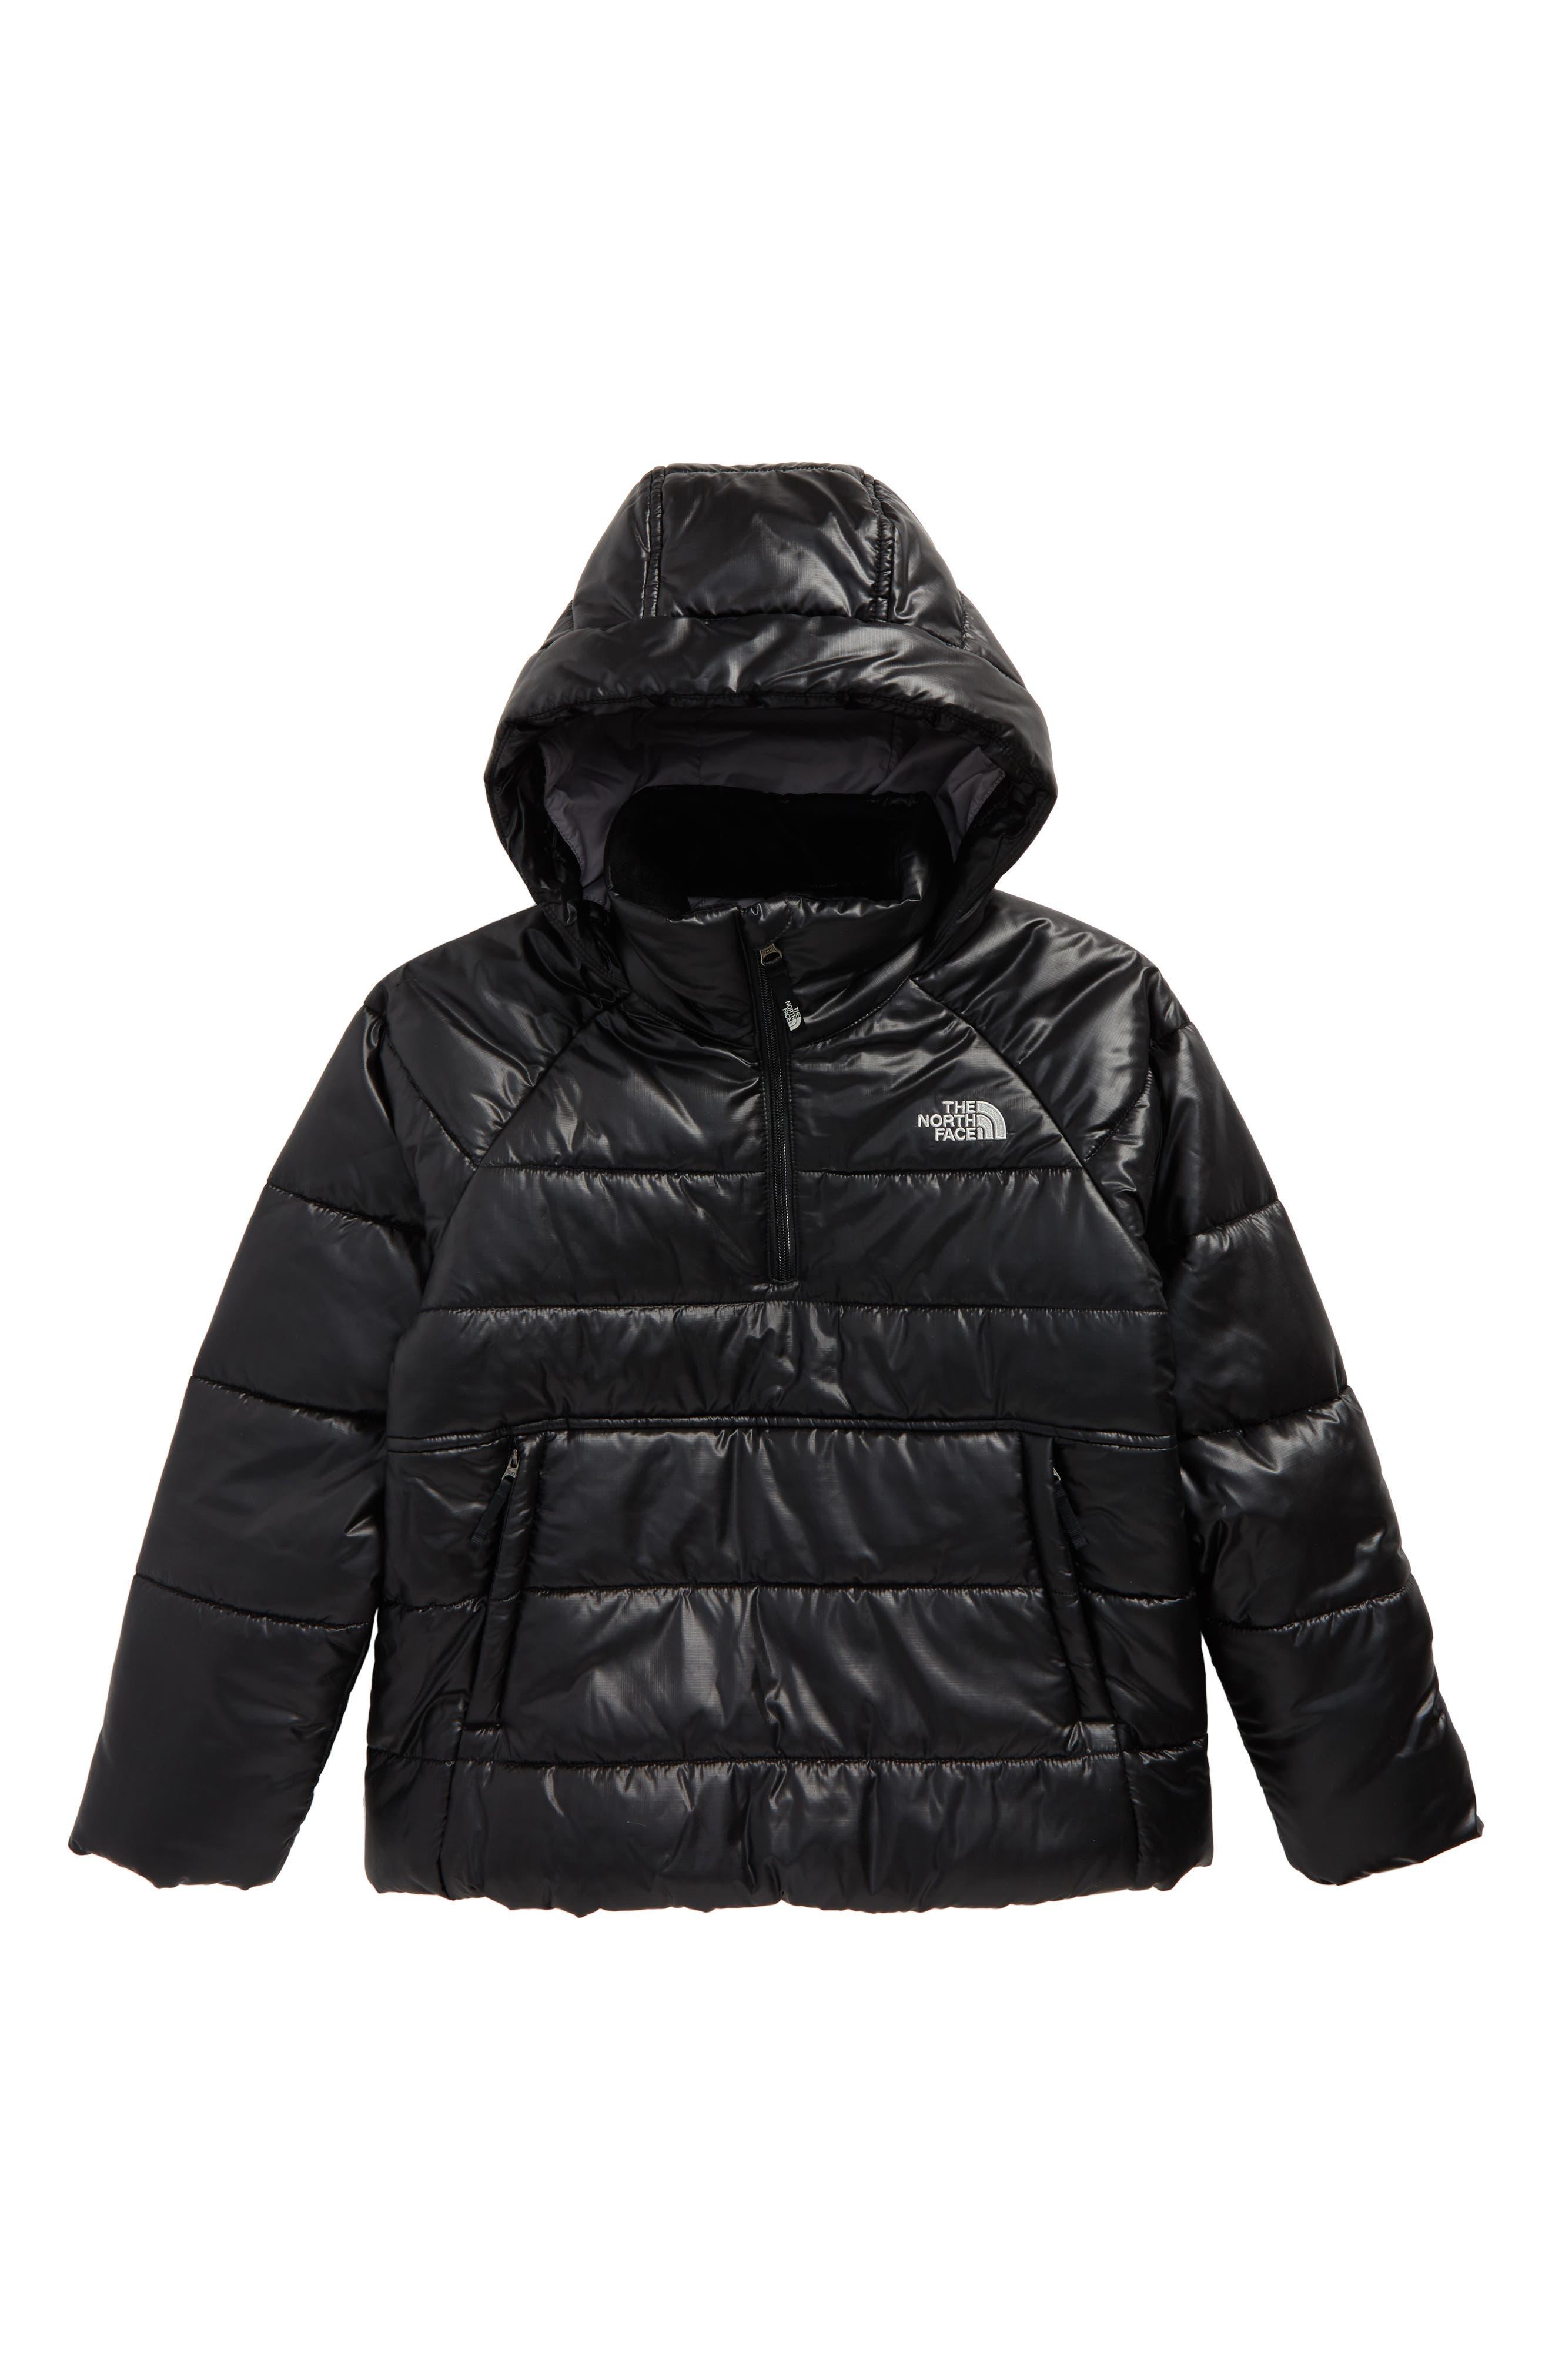 Gotham Heatseeker<sup>™</sup> Insulated Capelette,                         Main,                         color, Tnf Black